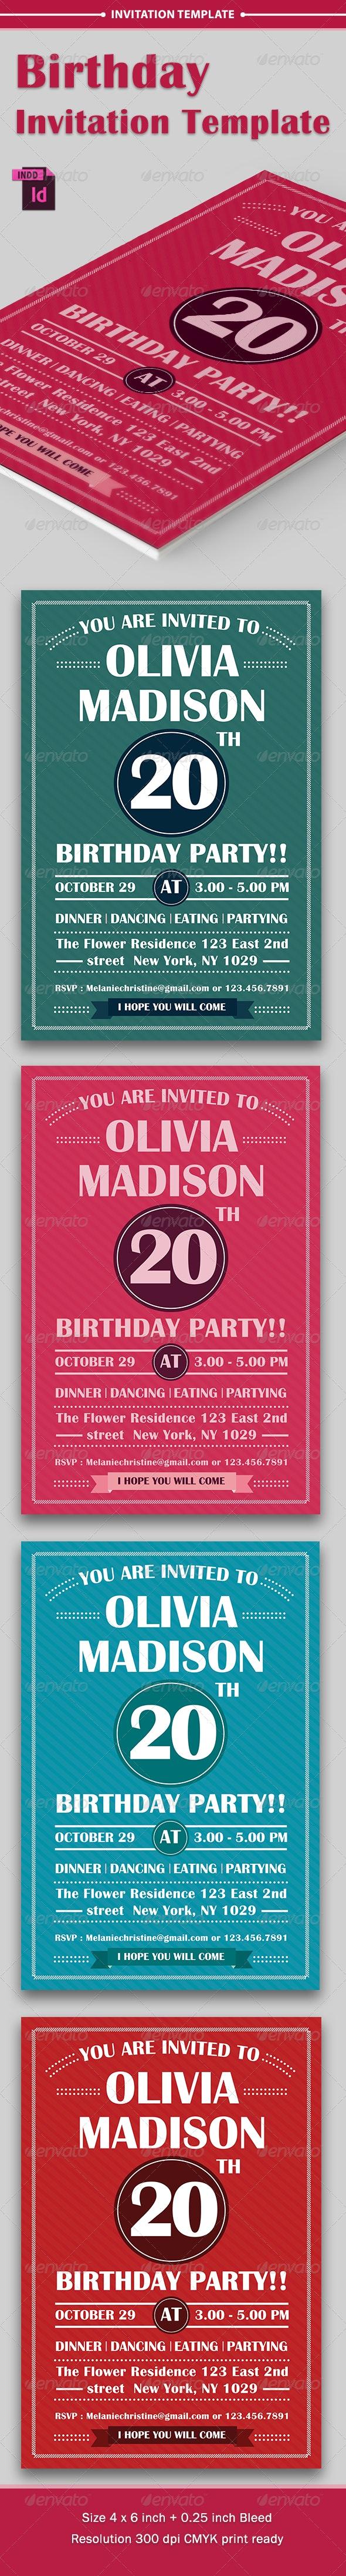 Birthday Party Invitation Template - Vol . 2 - Invitations Cards & Invites